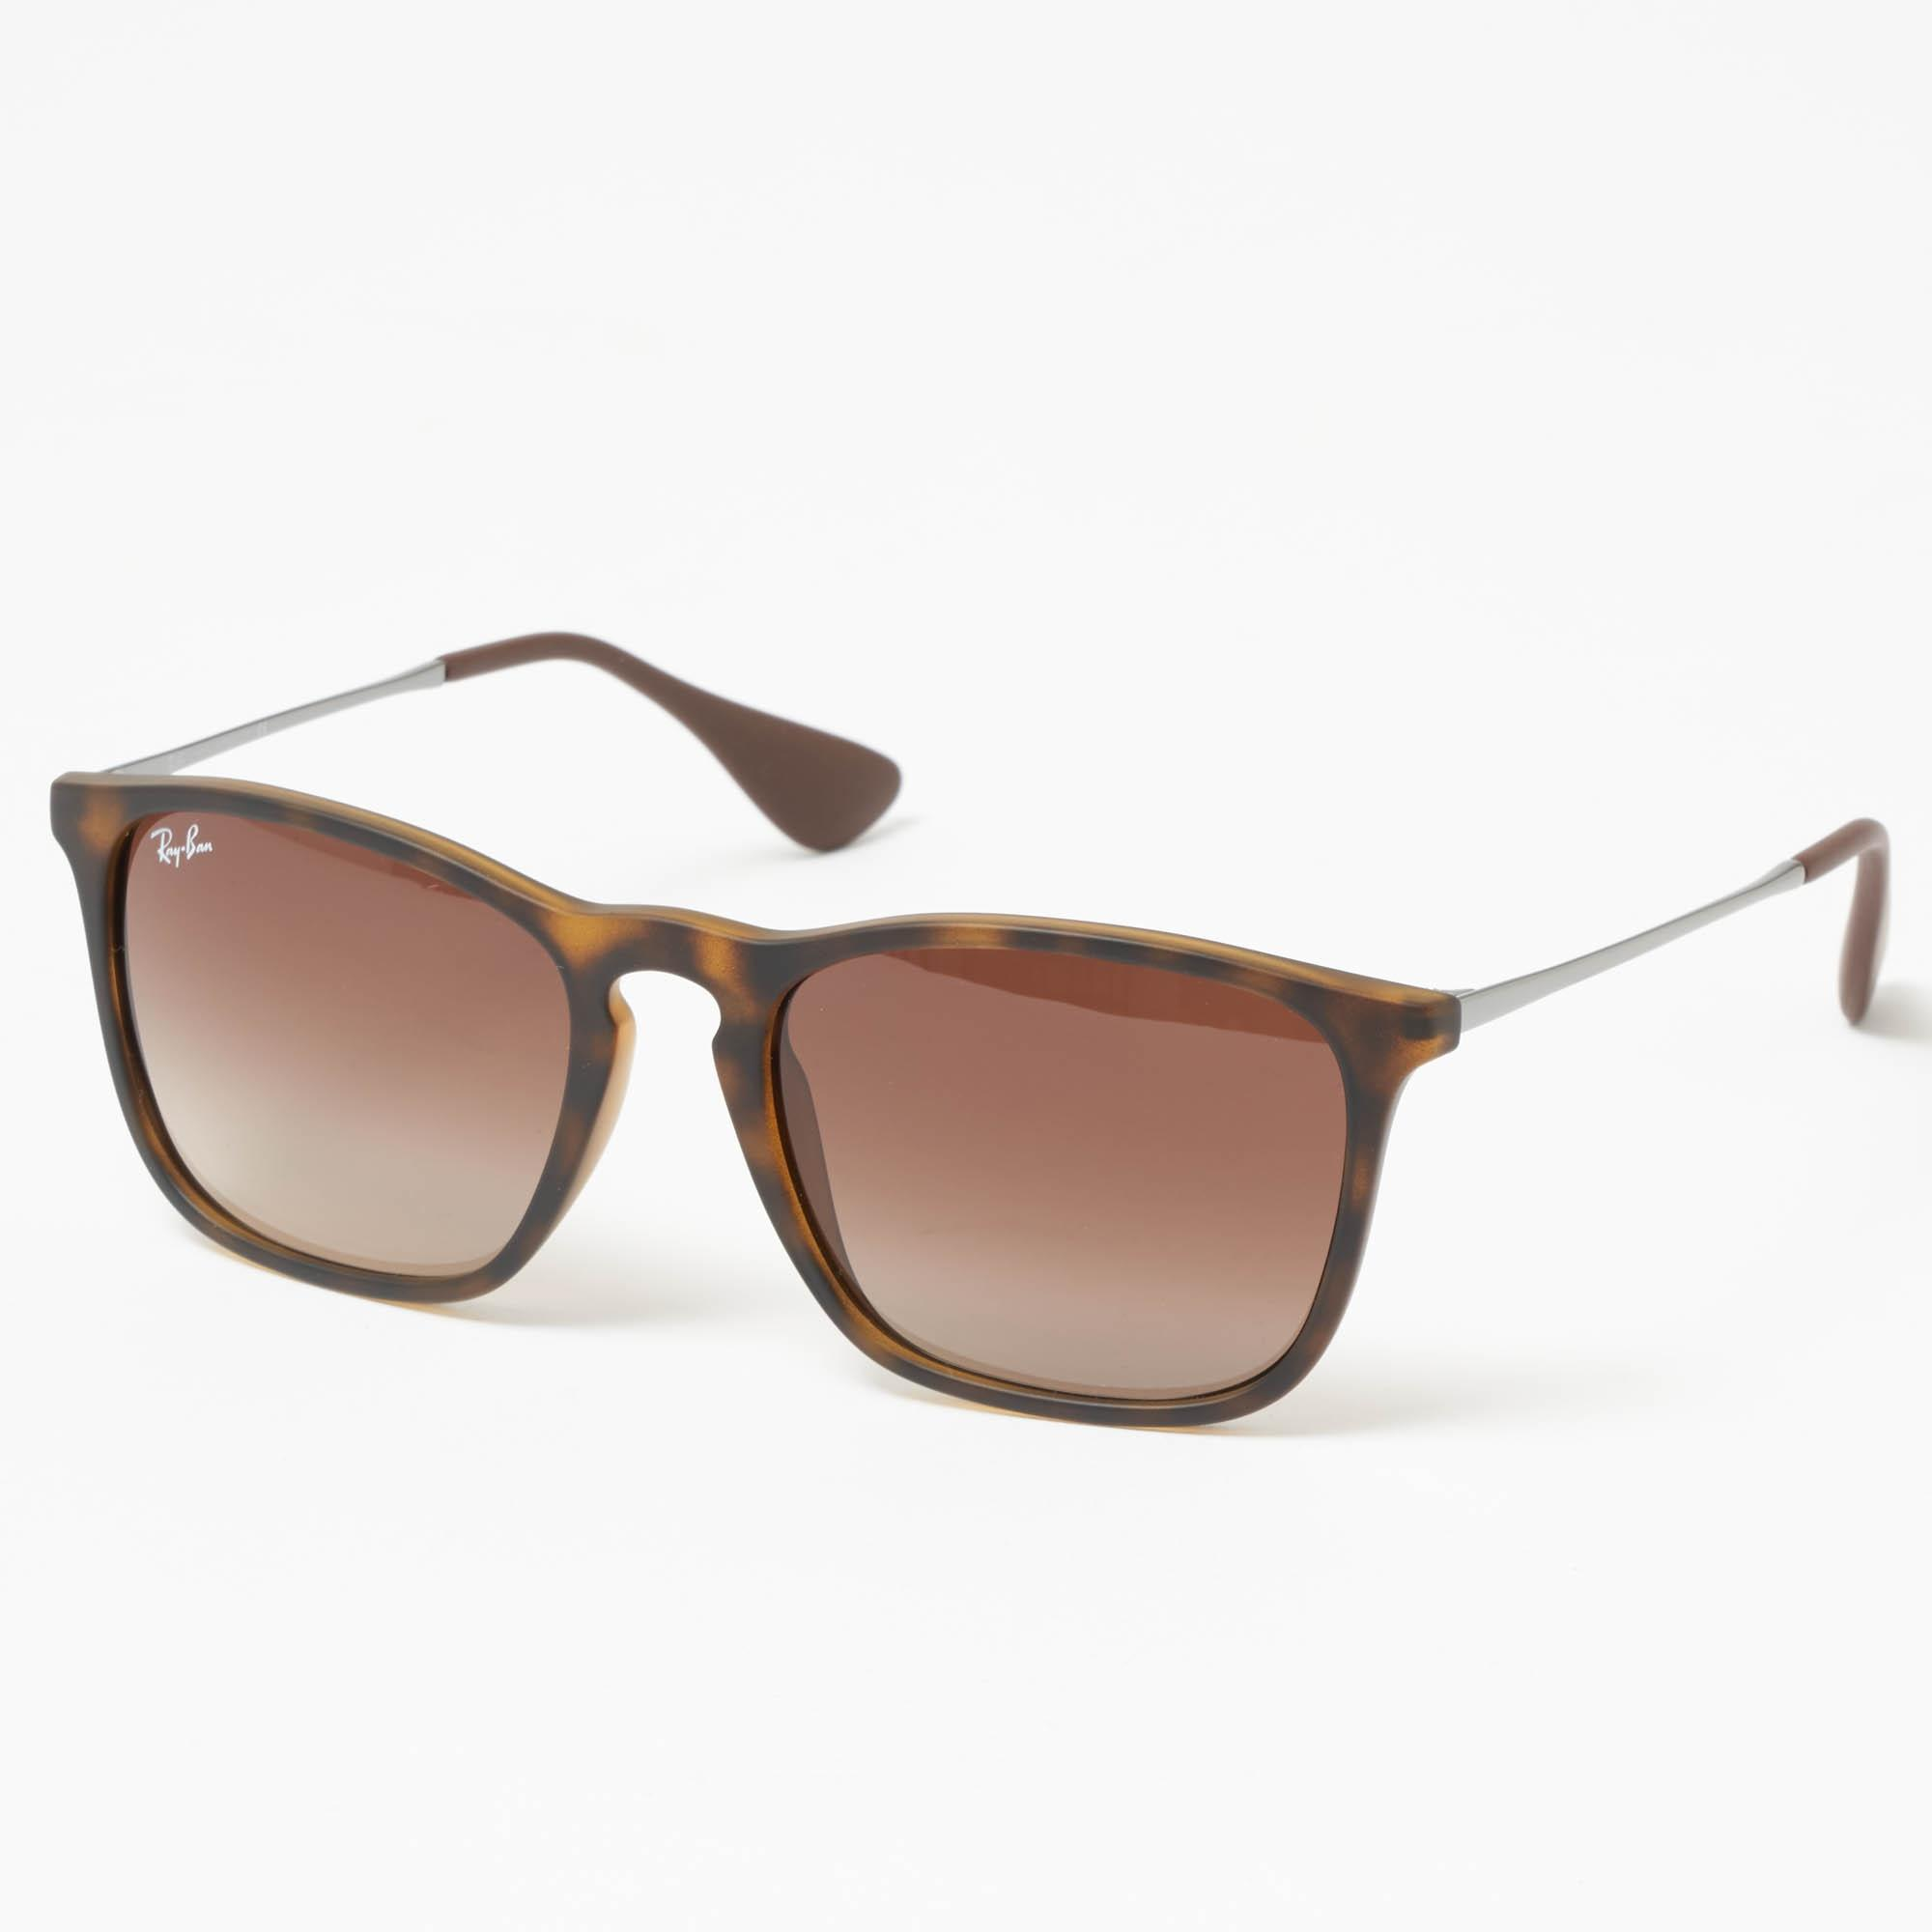 cdab105466 Ray-Ban Tortoise Chris Sunglasses - Brown Gradient Lenses for Men - Lyst